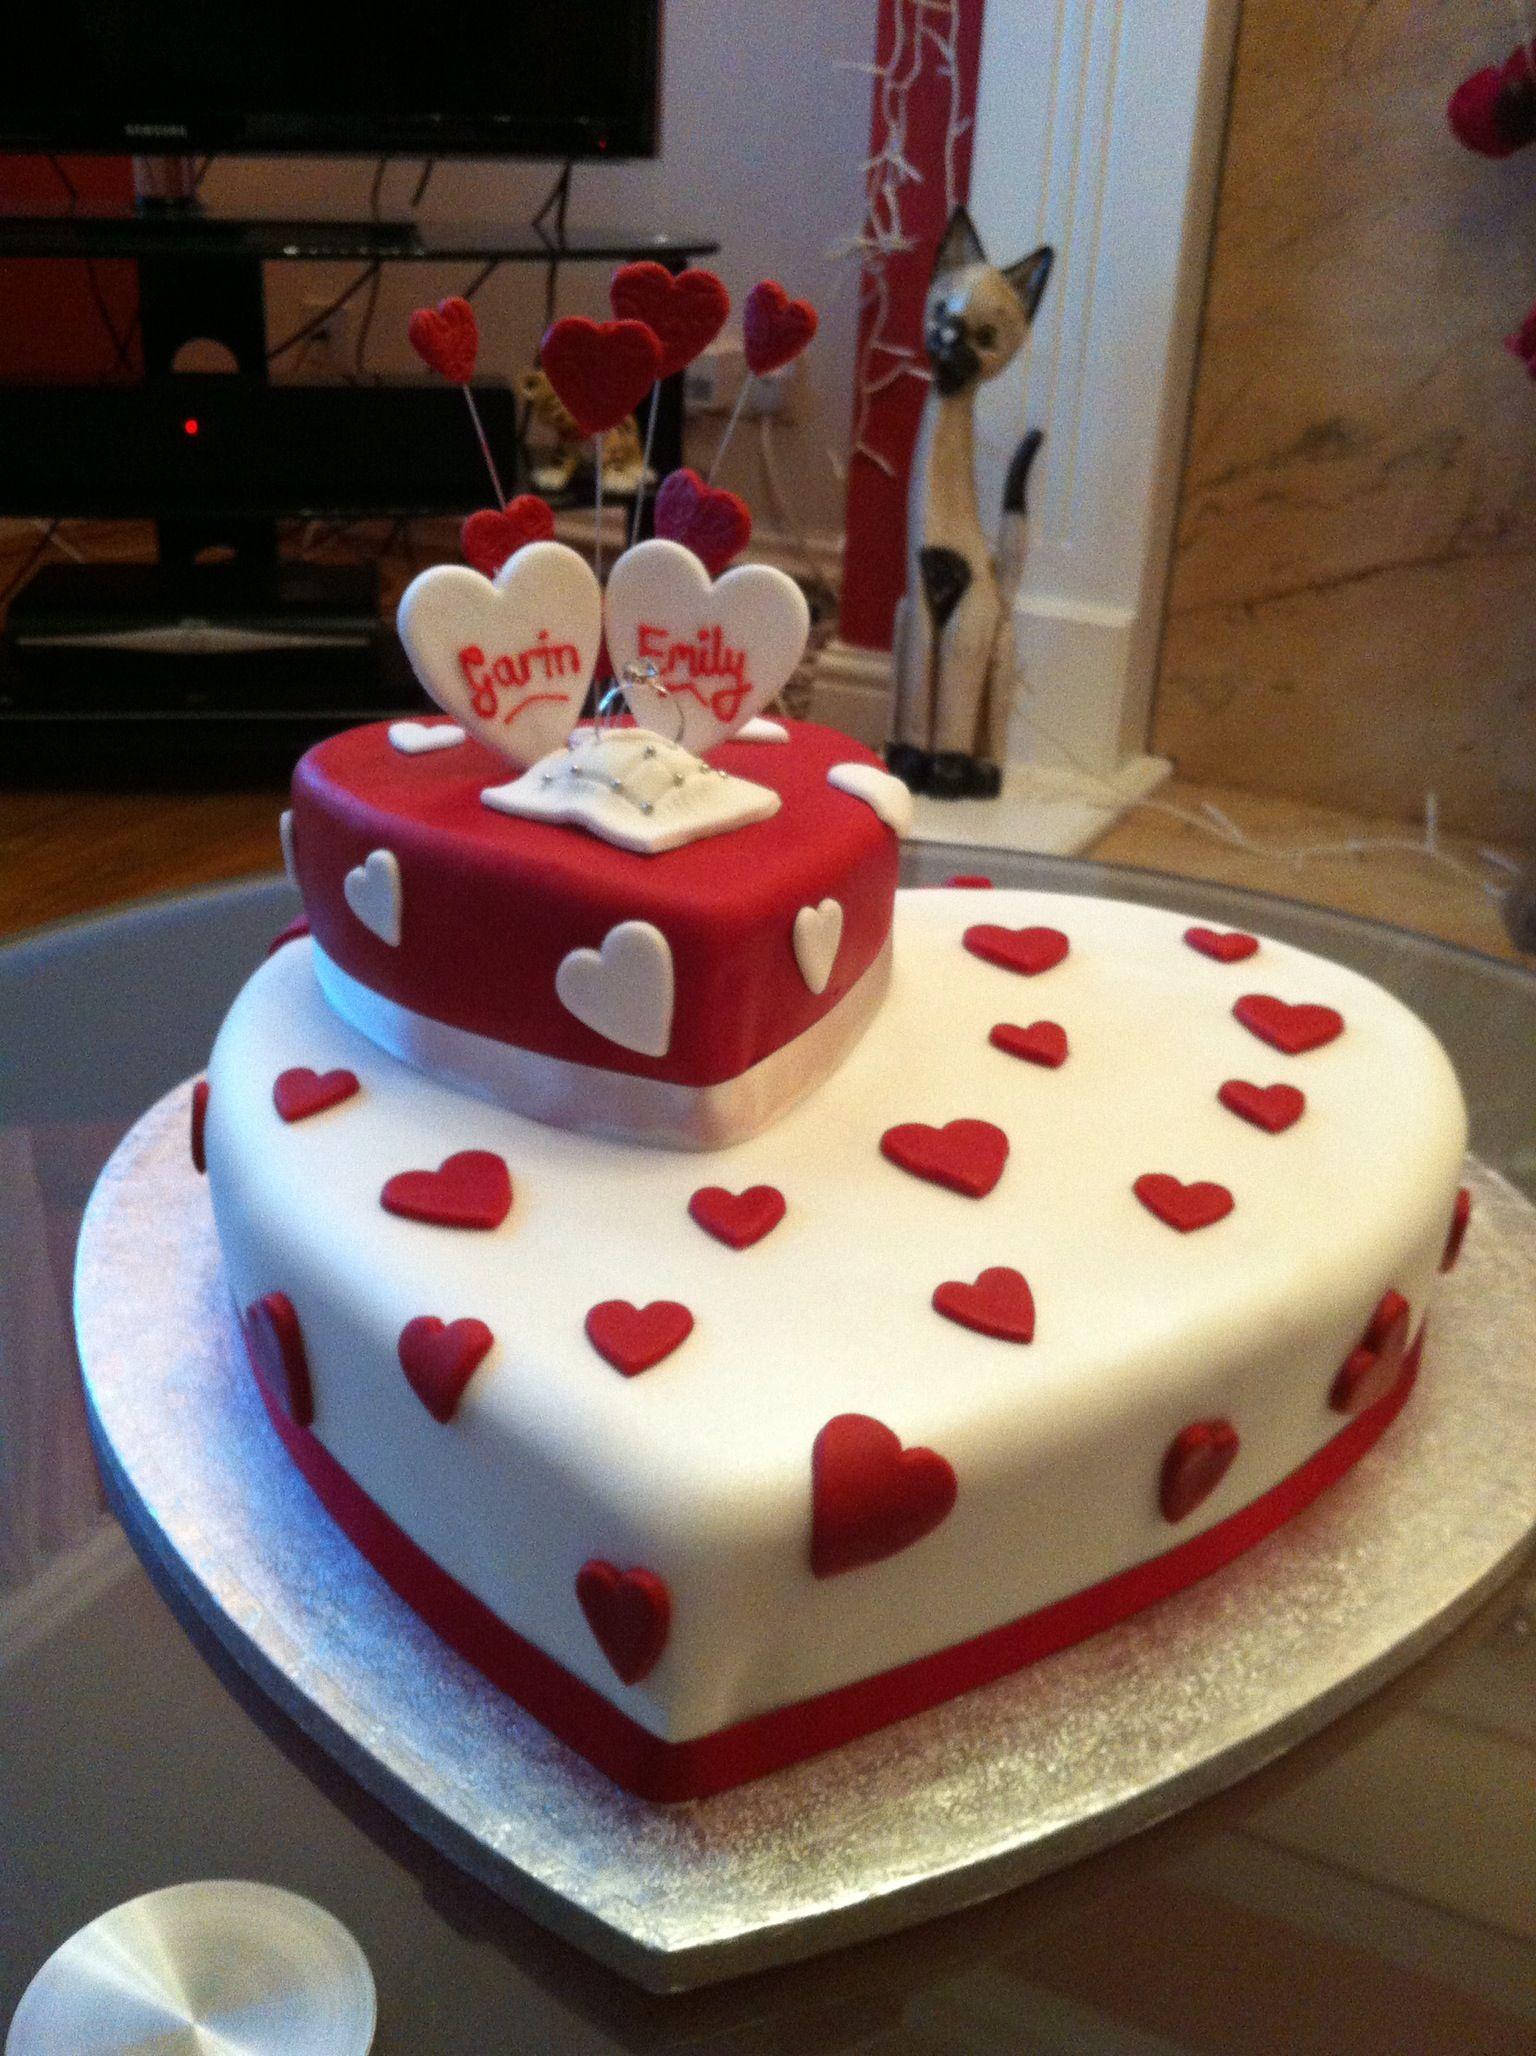 Pin By Sylvia Zinkstok Moinat On Wedding Engagement Cake Design Fancy Wedding Cakes Cool Wedding Cakes